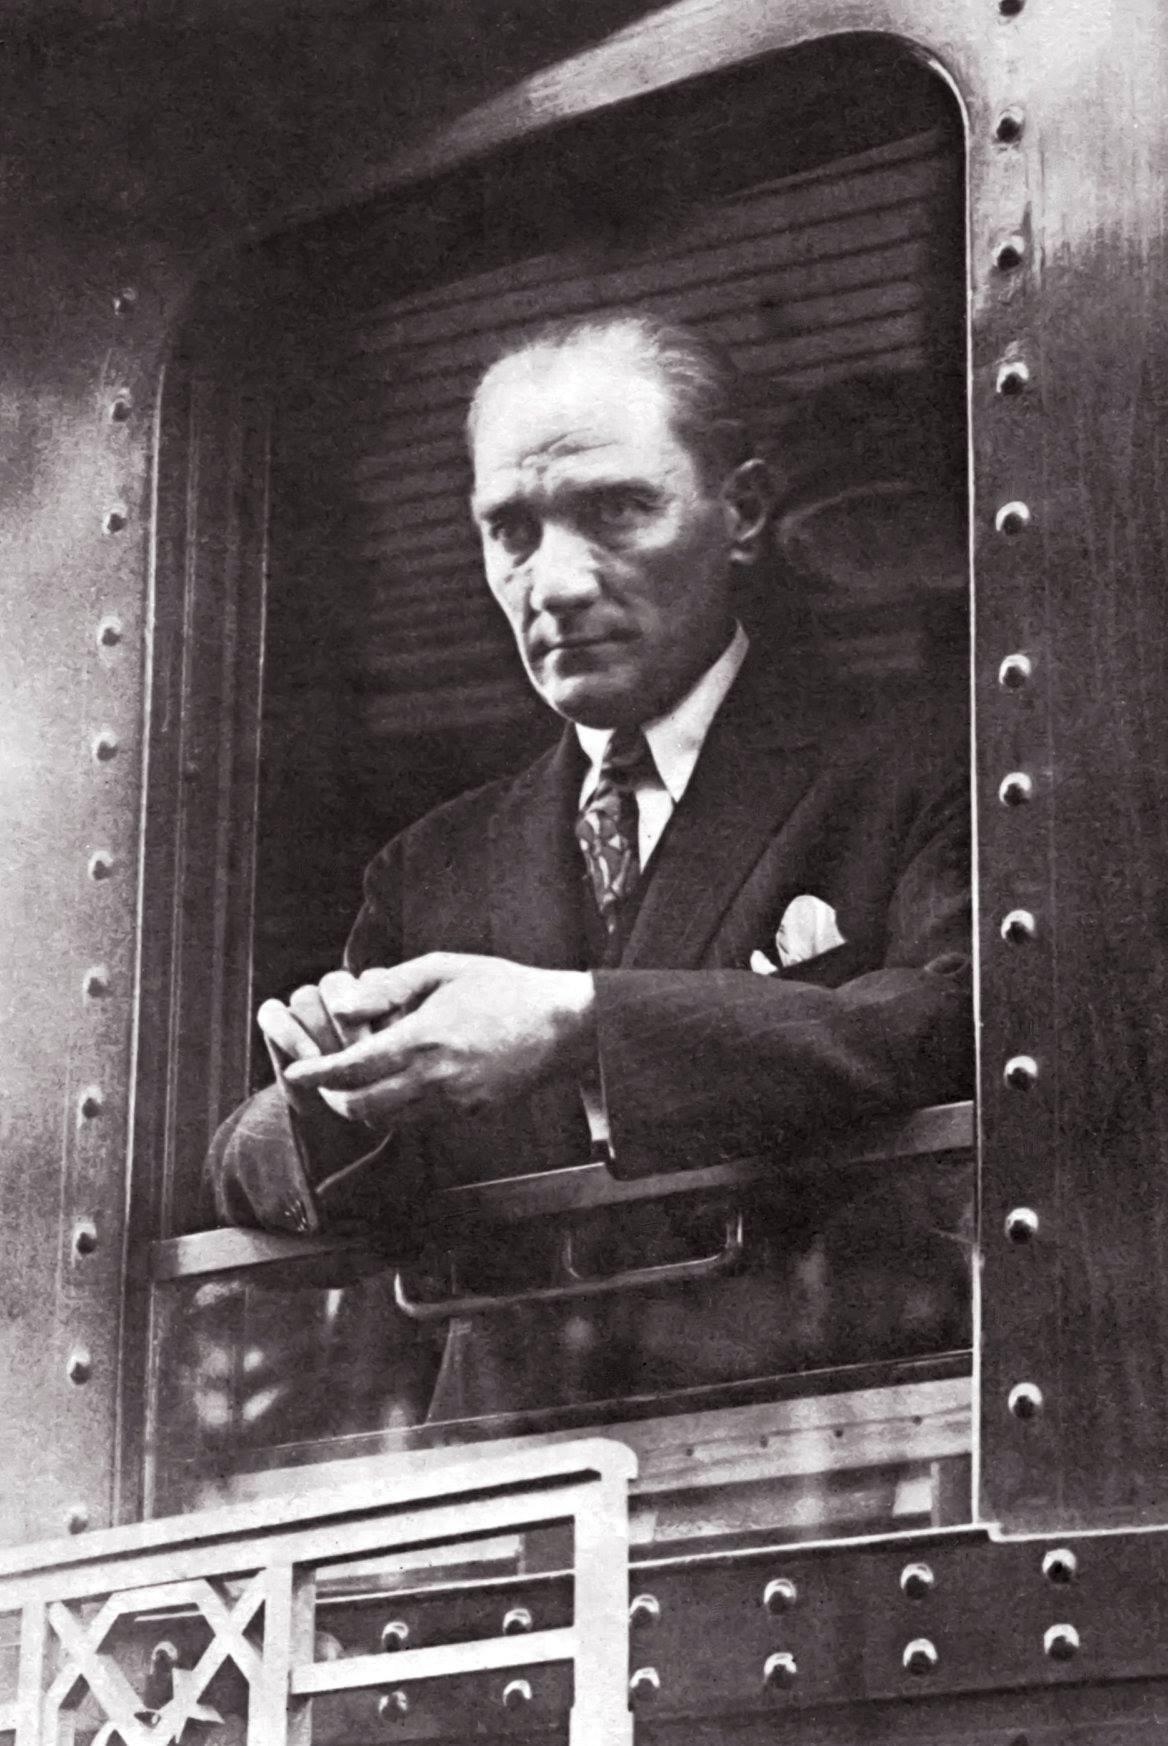 Ataturk and Railways